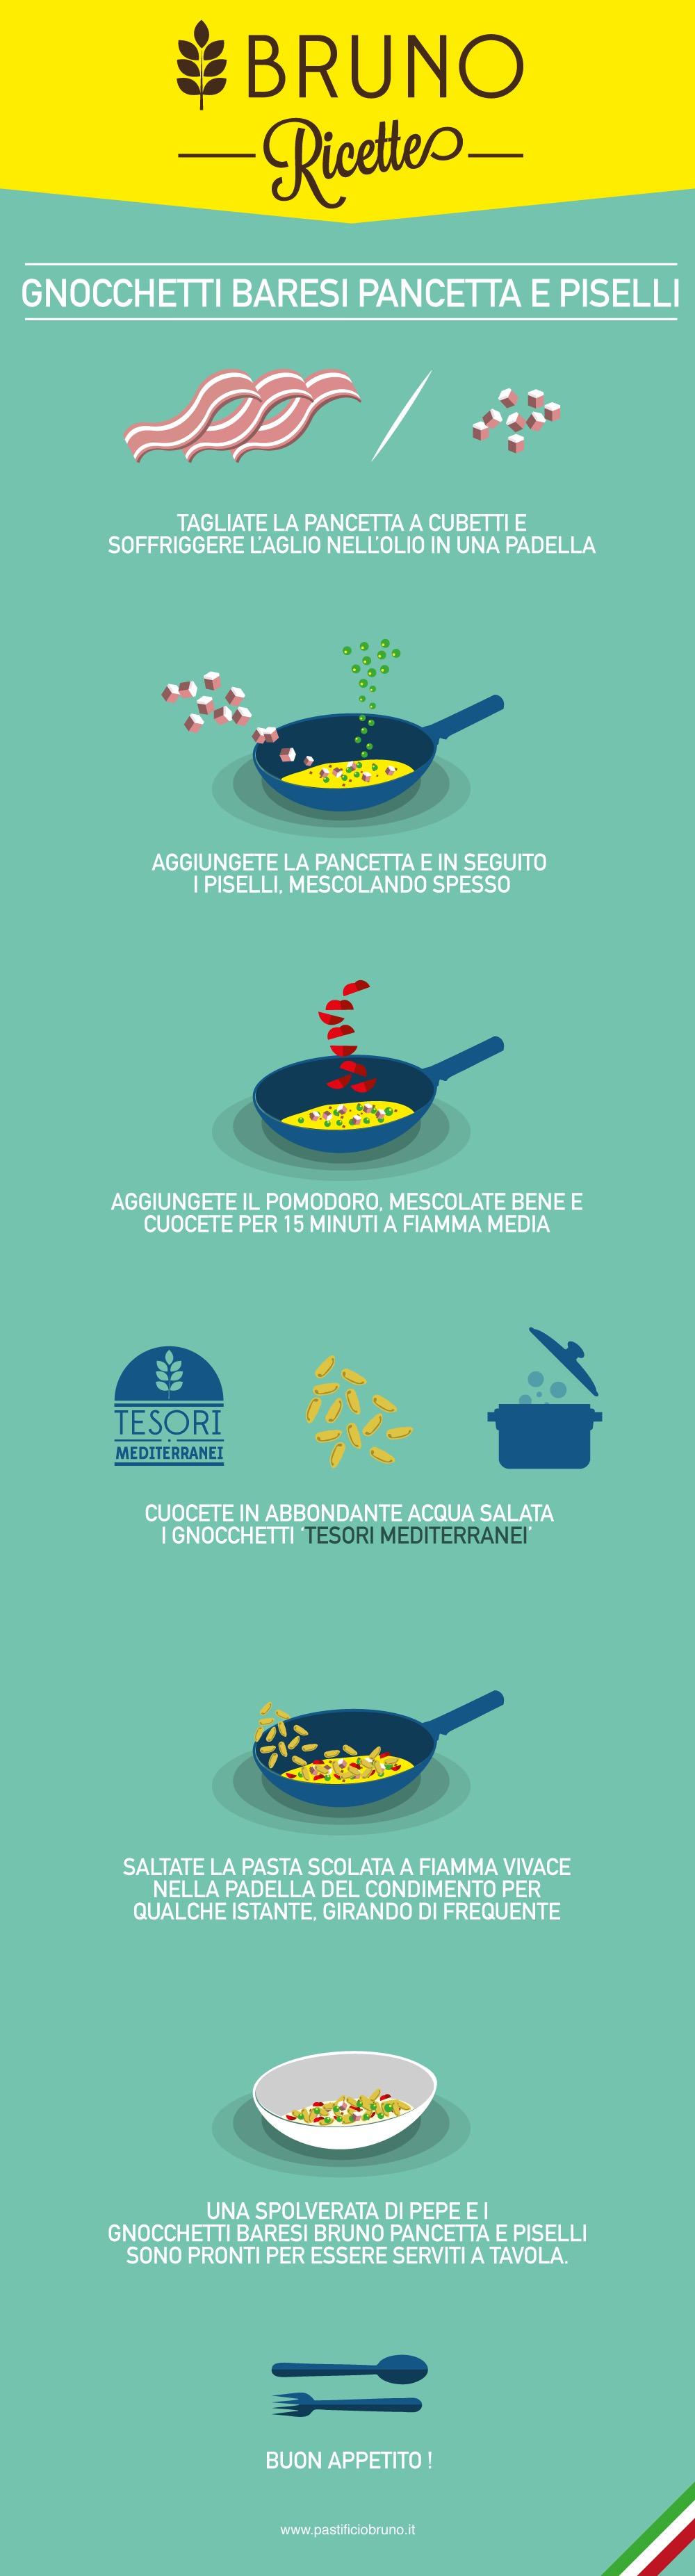 gnocchetti-baresi-pancetta-e-piselli-brunoinforicette